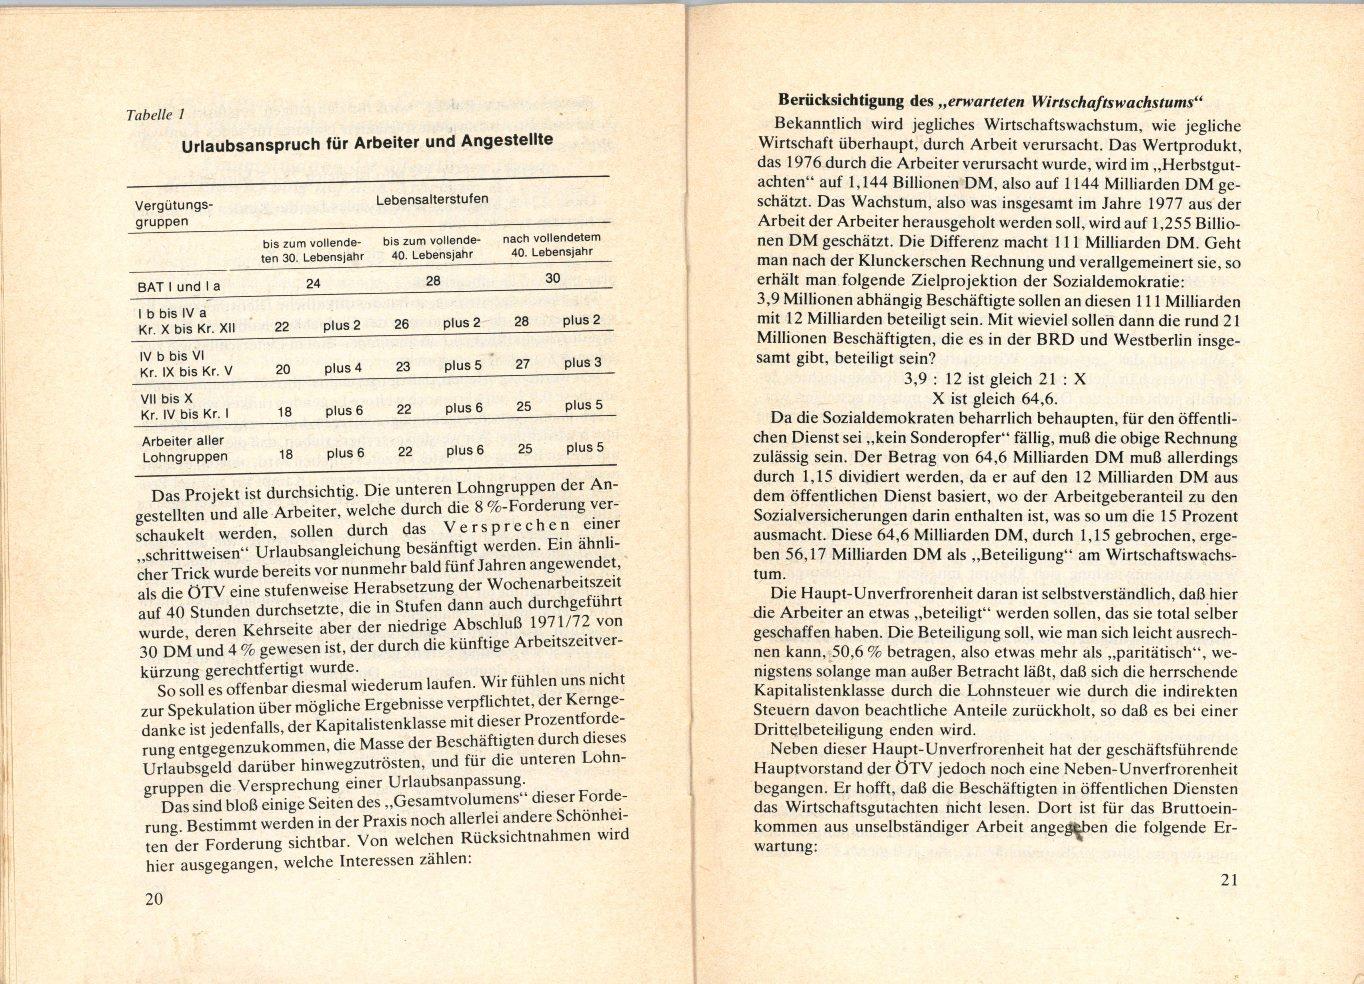 OTV_KBW_Klassenversoehnung_1976_11